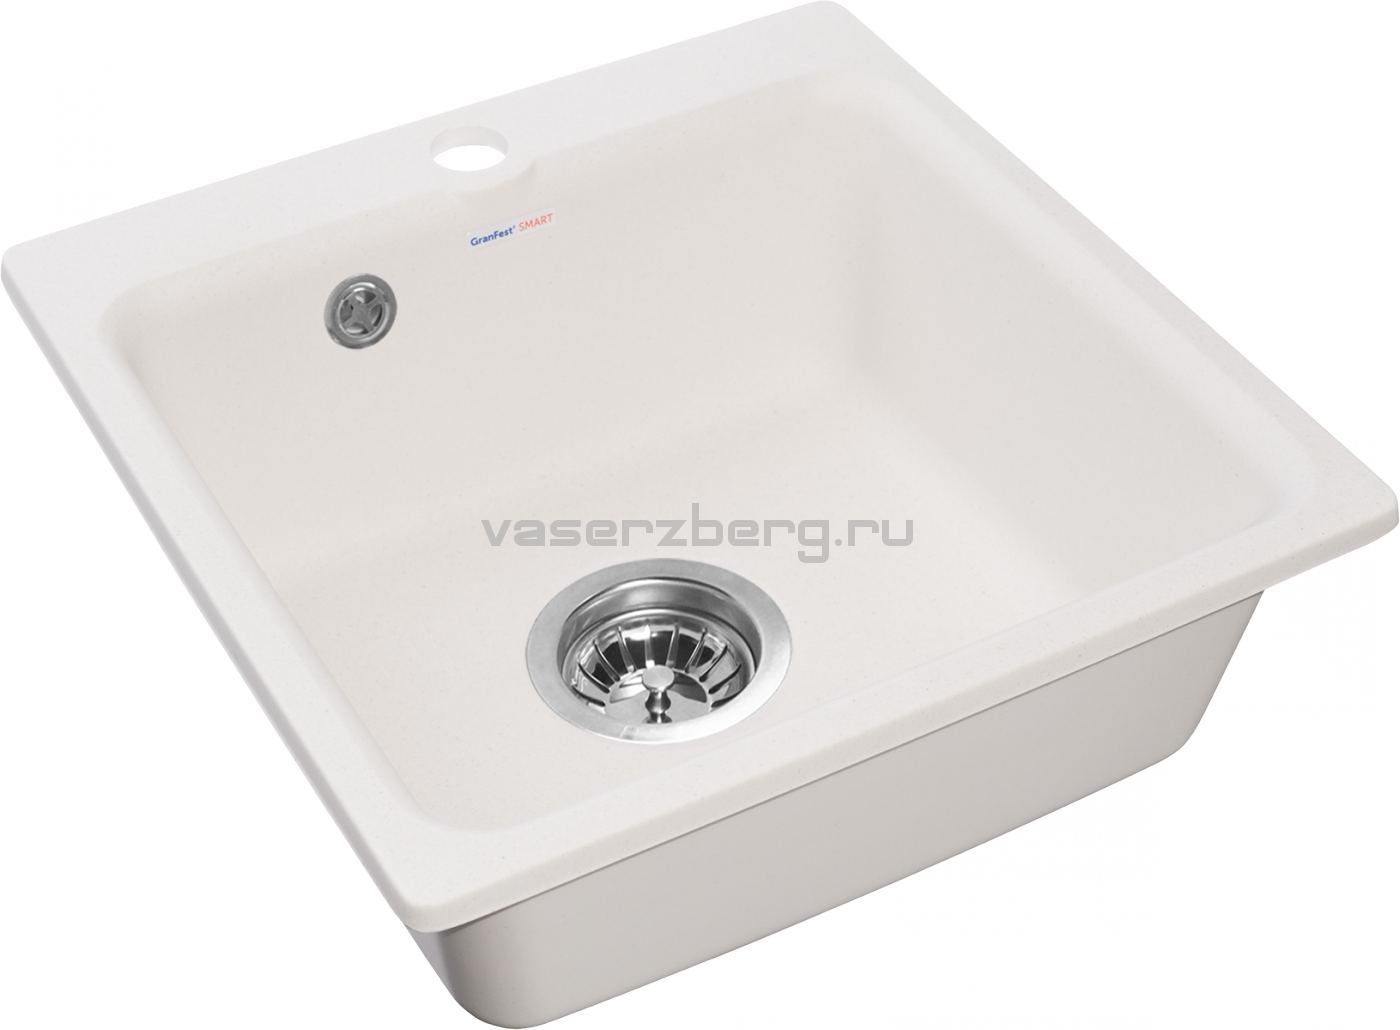 Мраморная мойка для кухни GranFest Smart SM430 Белый